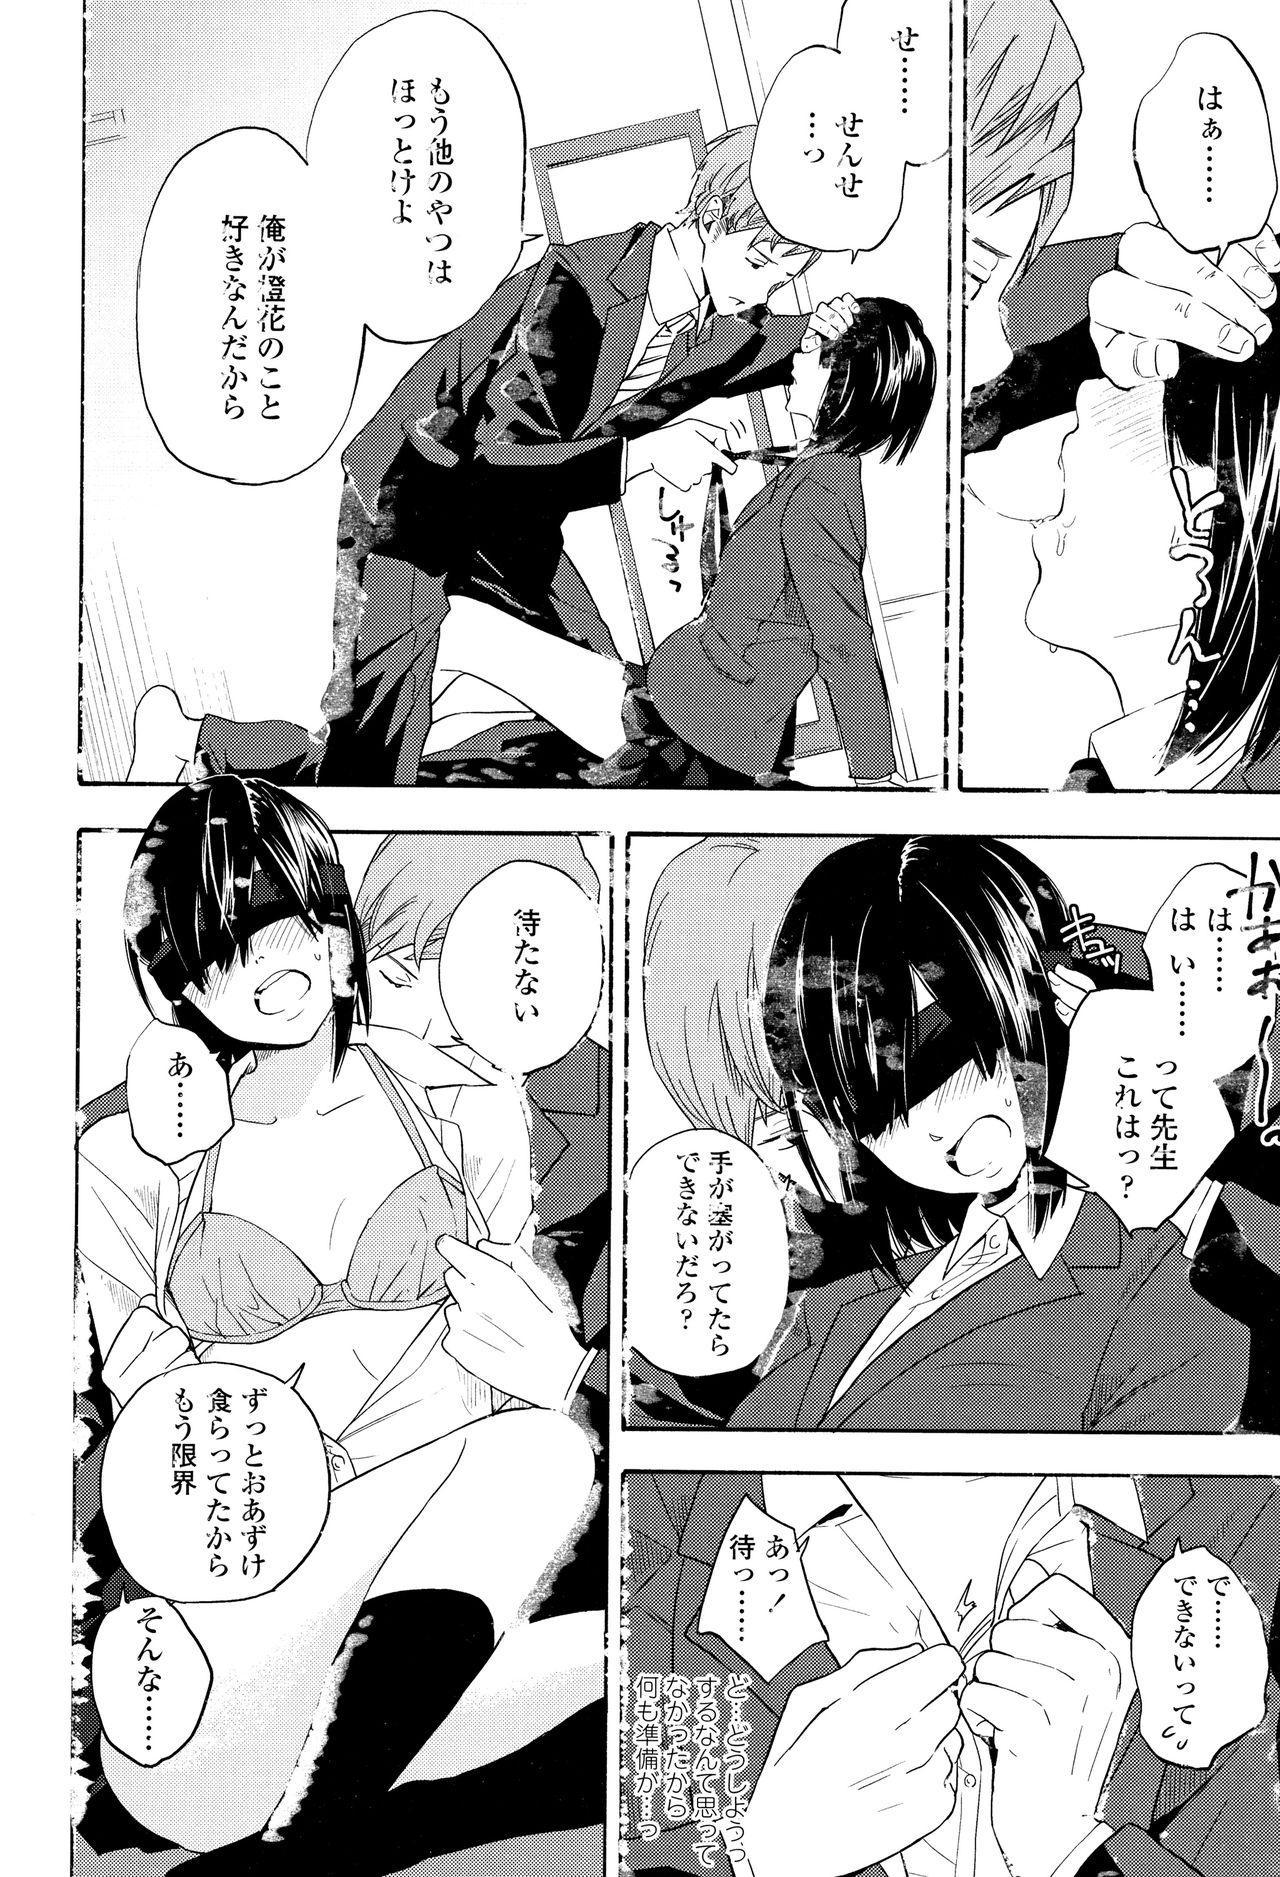 Shishunki no Eros - puberty eros 10